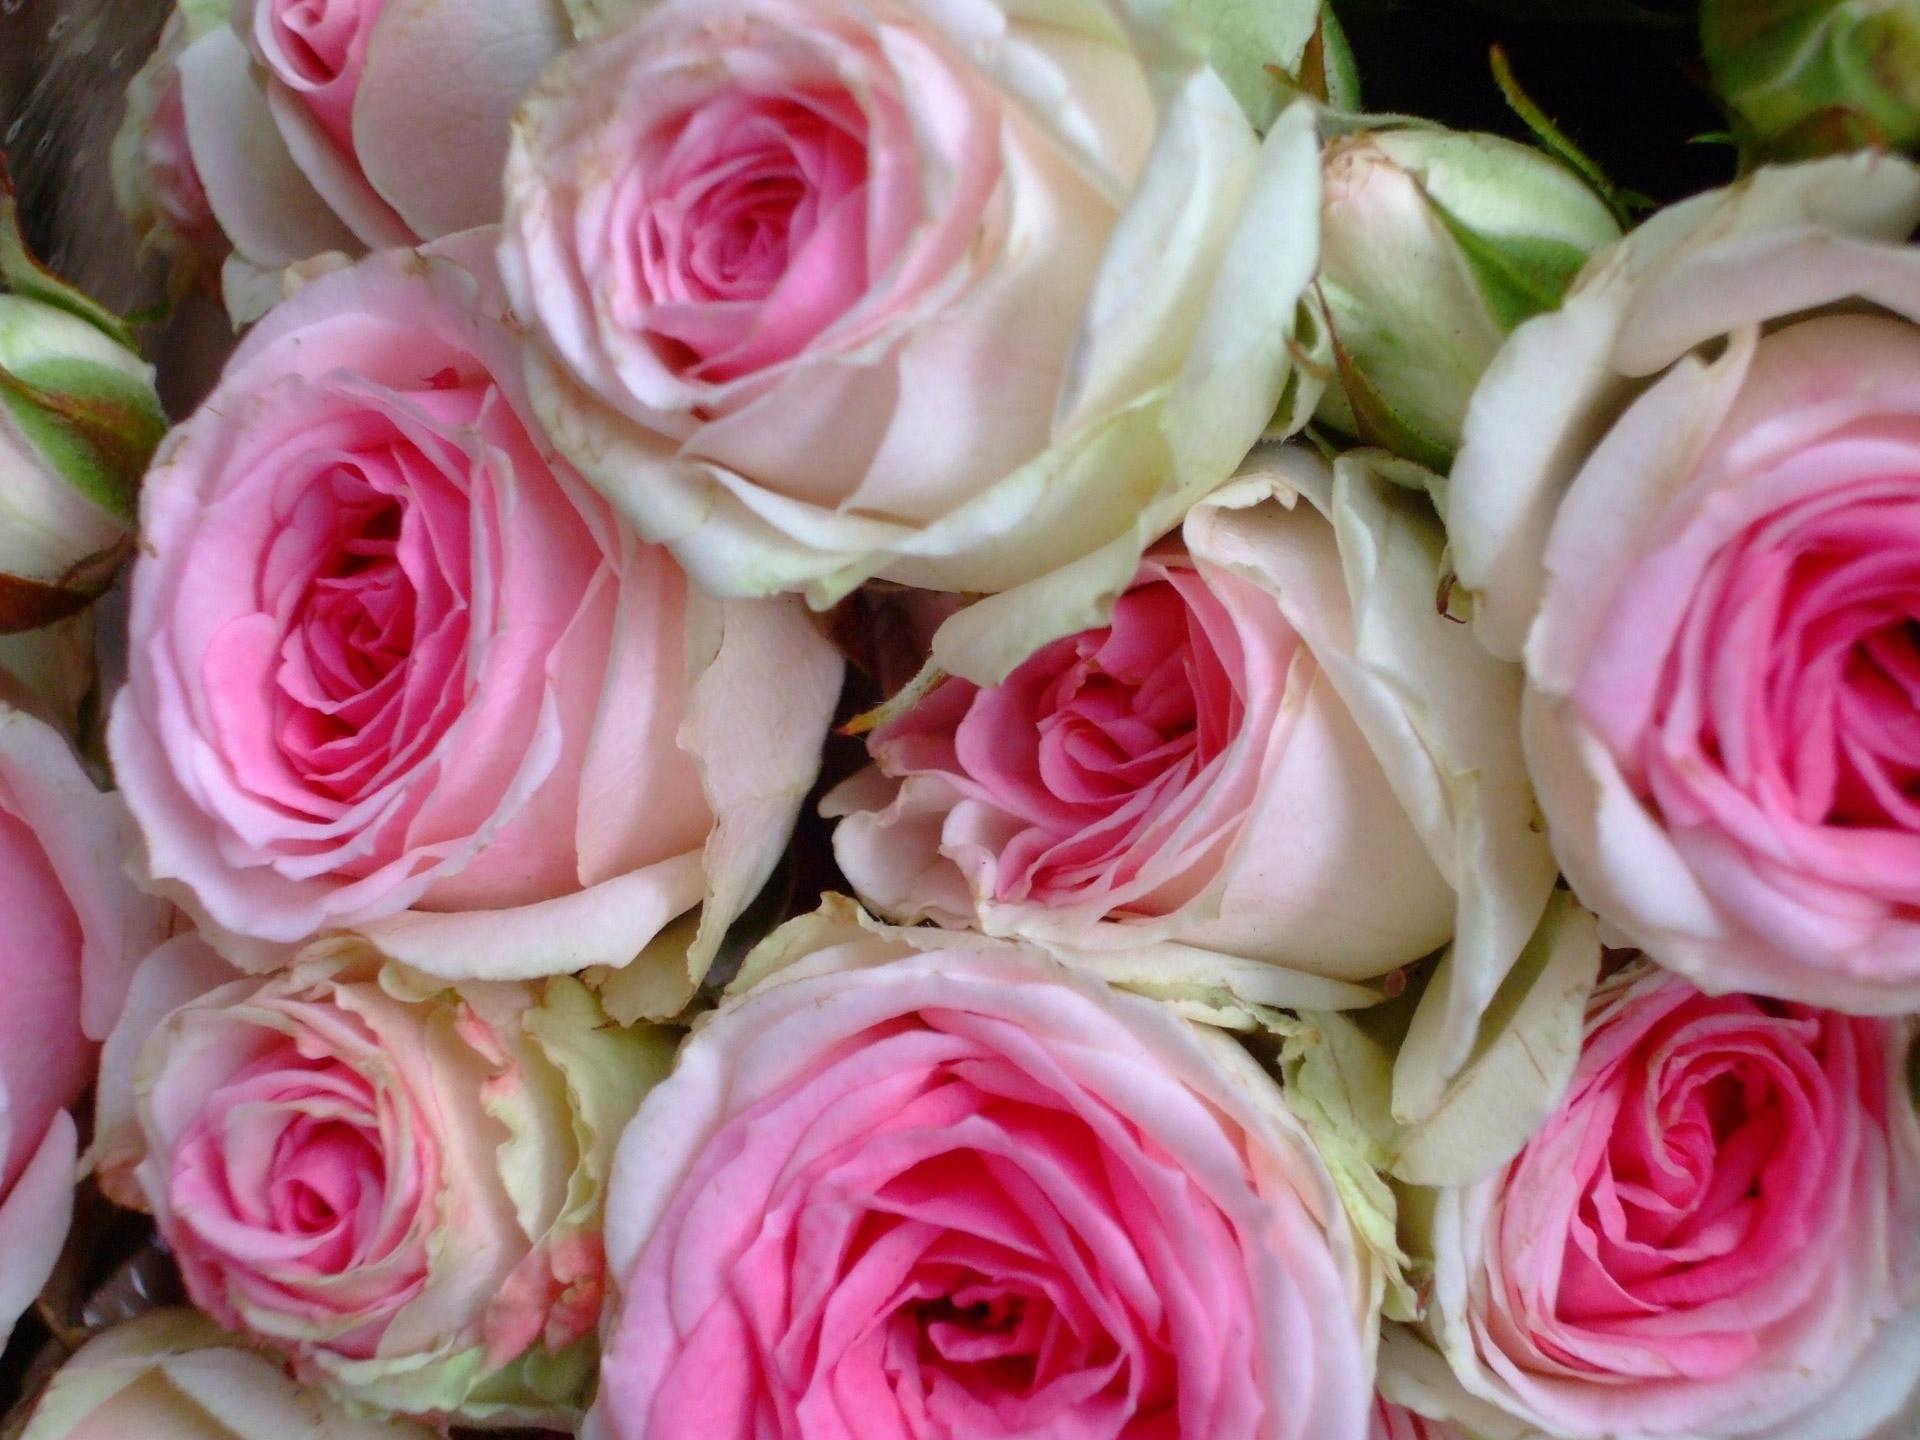 Fall Daisy Wallpaper Cabbage Rose Wallpaper Hd Pixelstalk Net